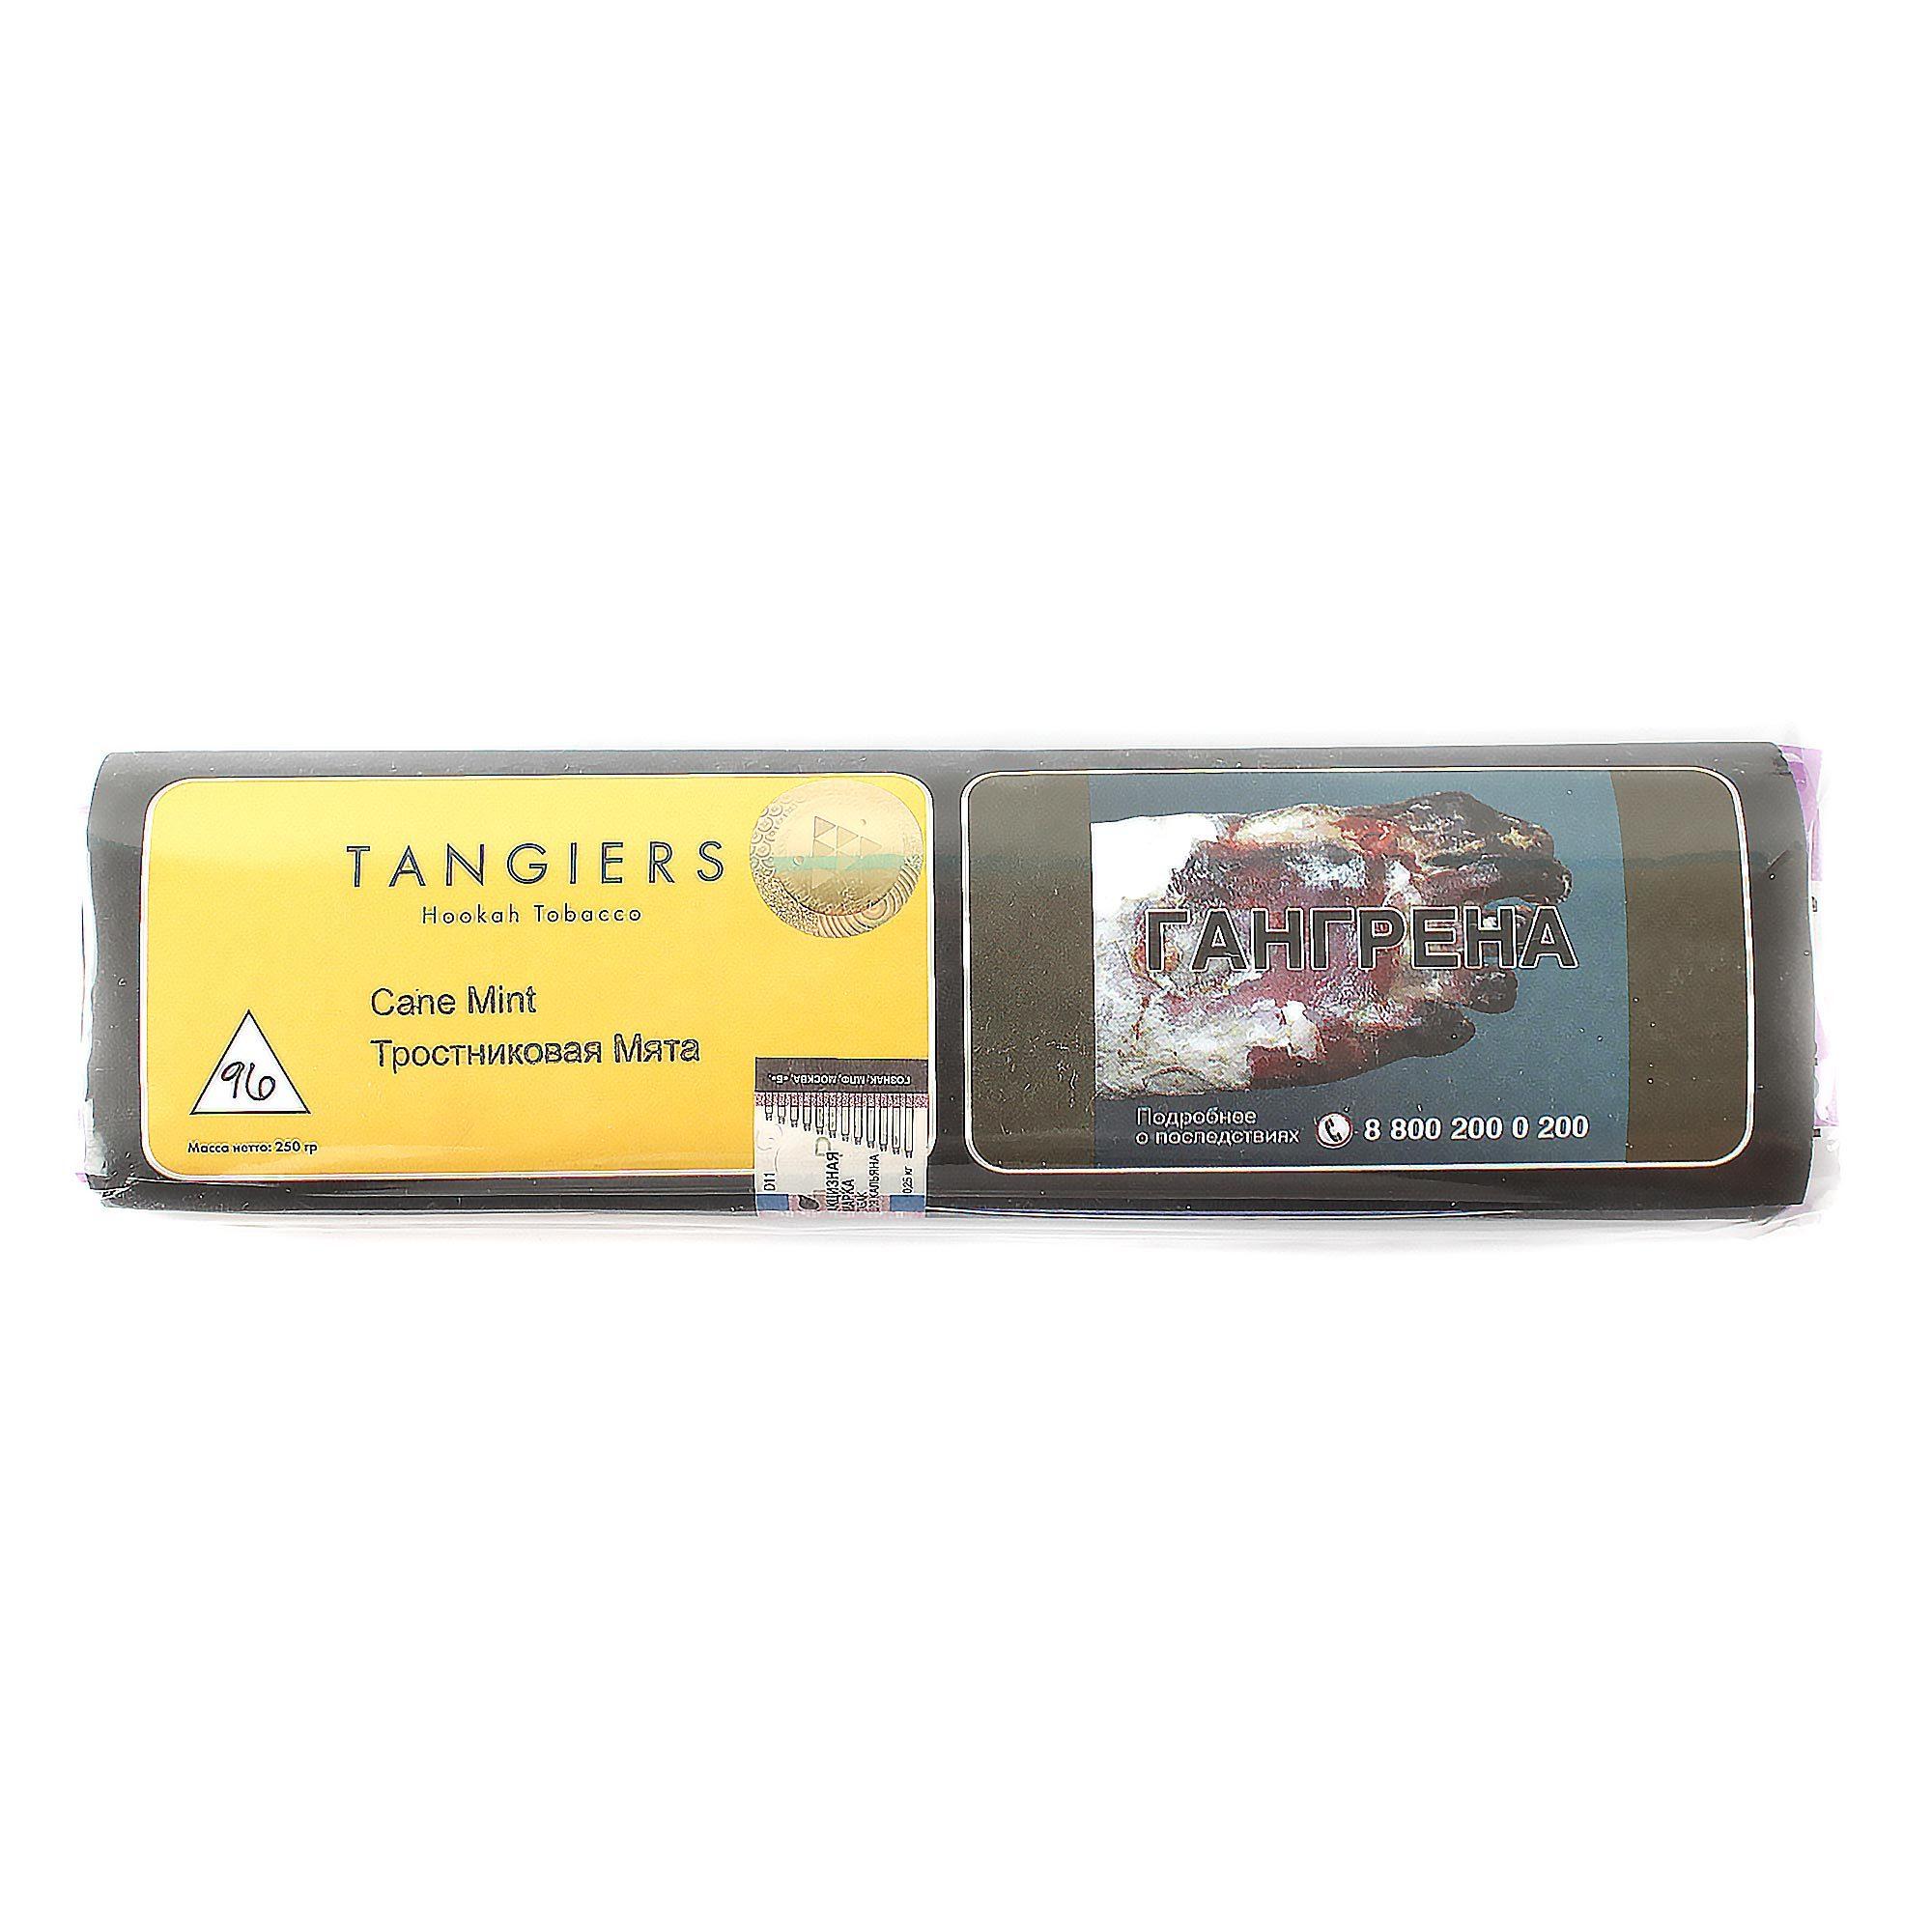 Табак для кальяна Tangiers Noir (желтый) 96 Cane mint